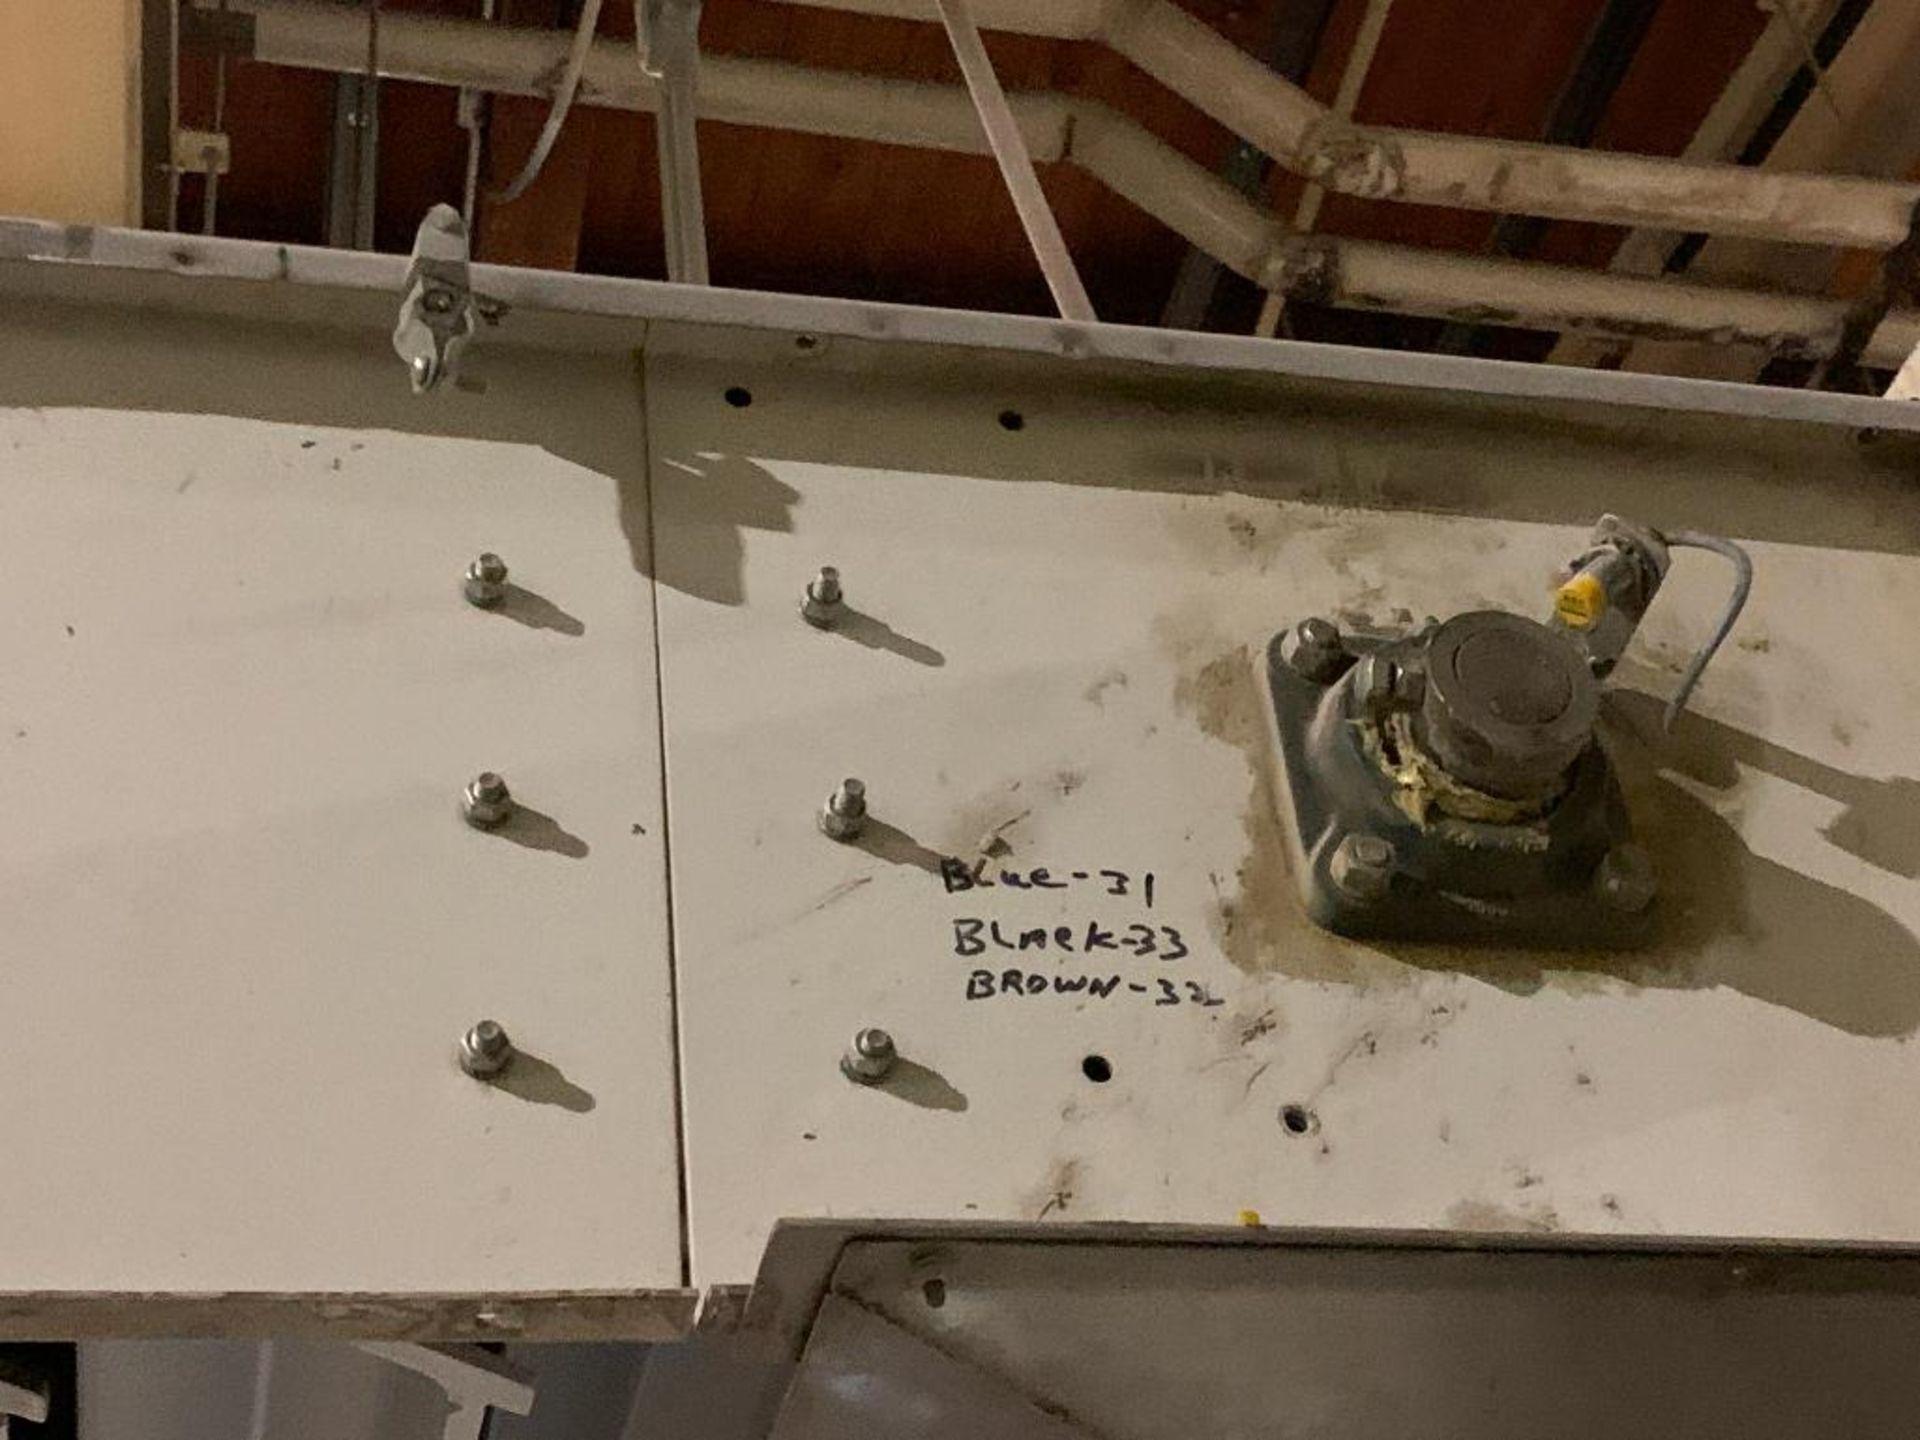 Meyer overlapping bucket elevator, model PA462-24-S - Image 6 of 17